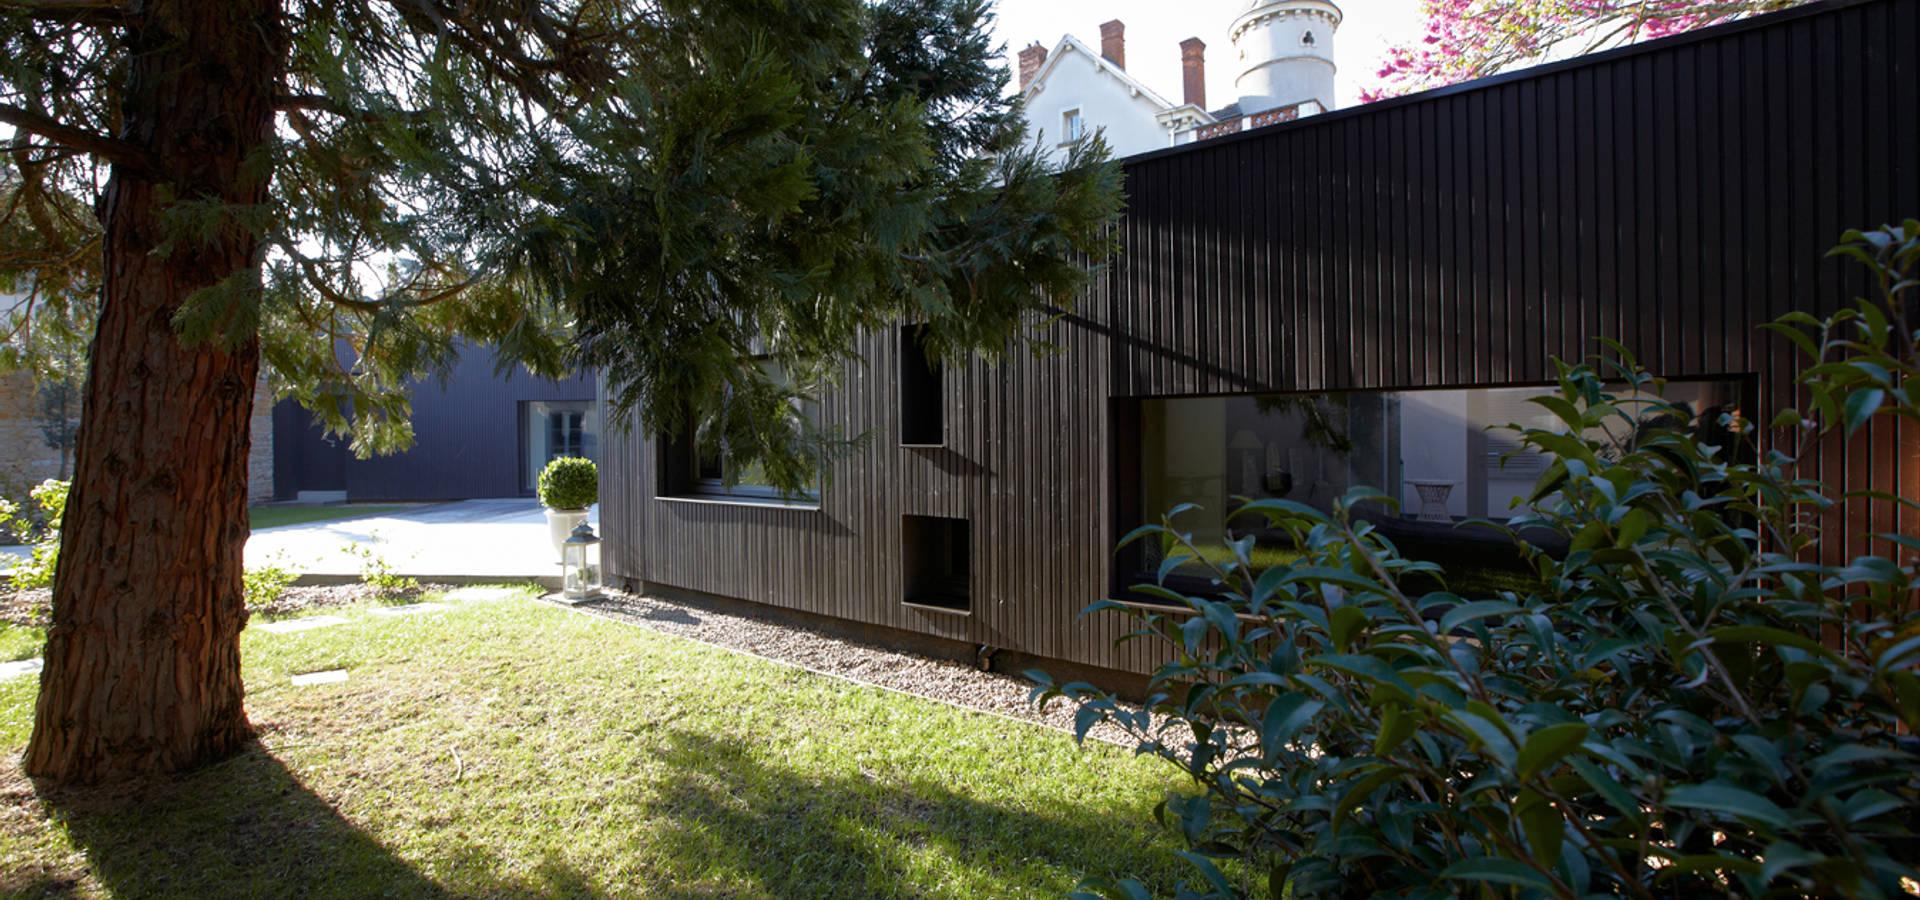 Caroline Wach Architecture